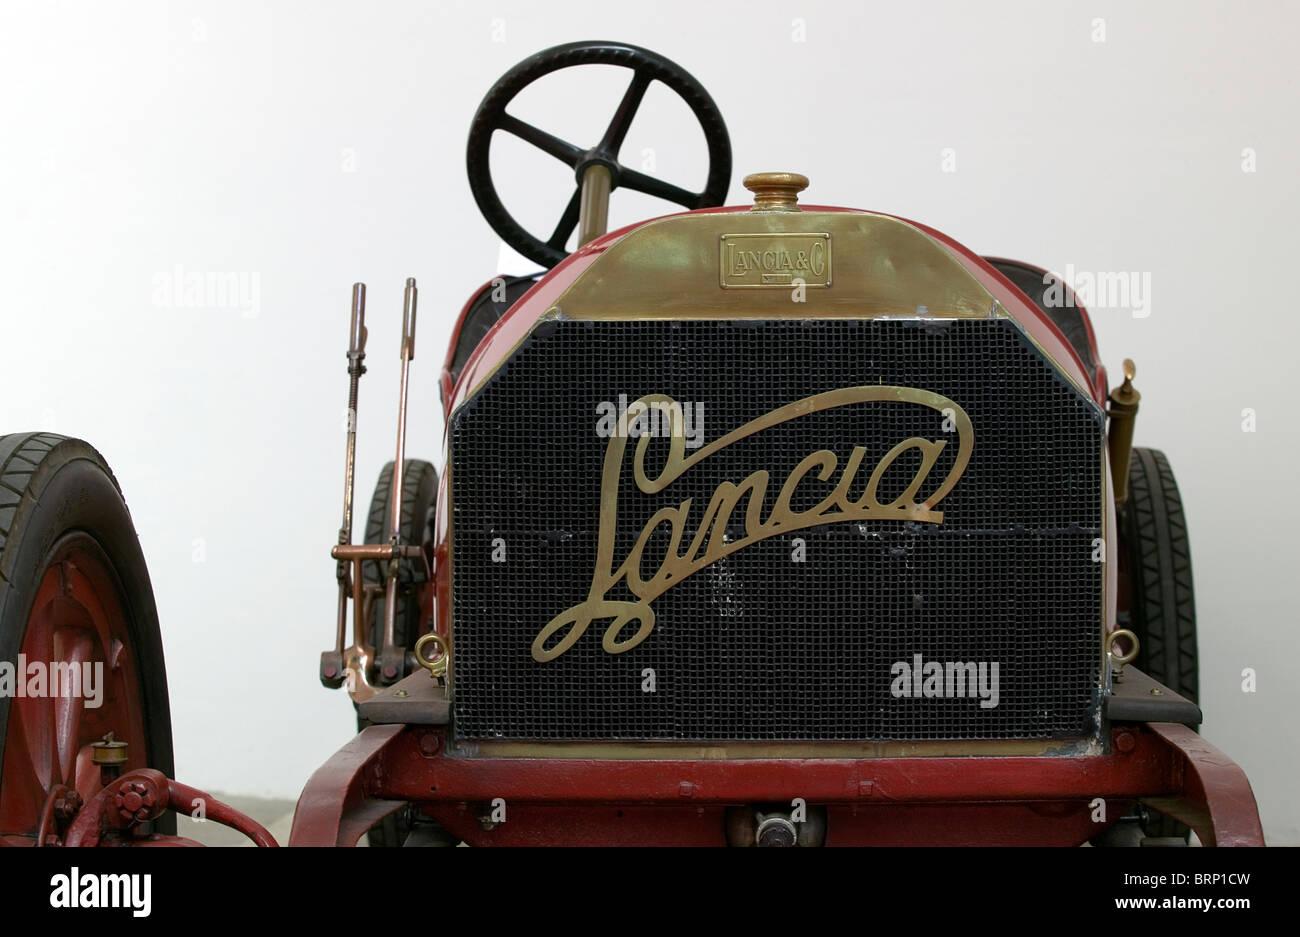 Edwardian Lancia racing car - Stock Image